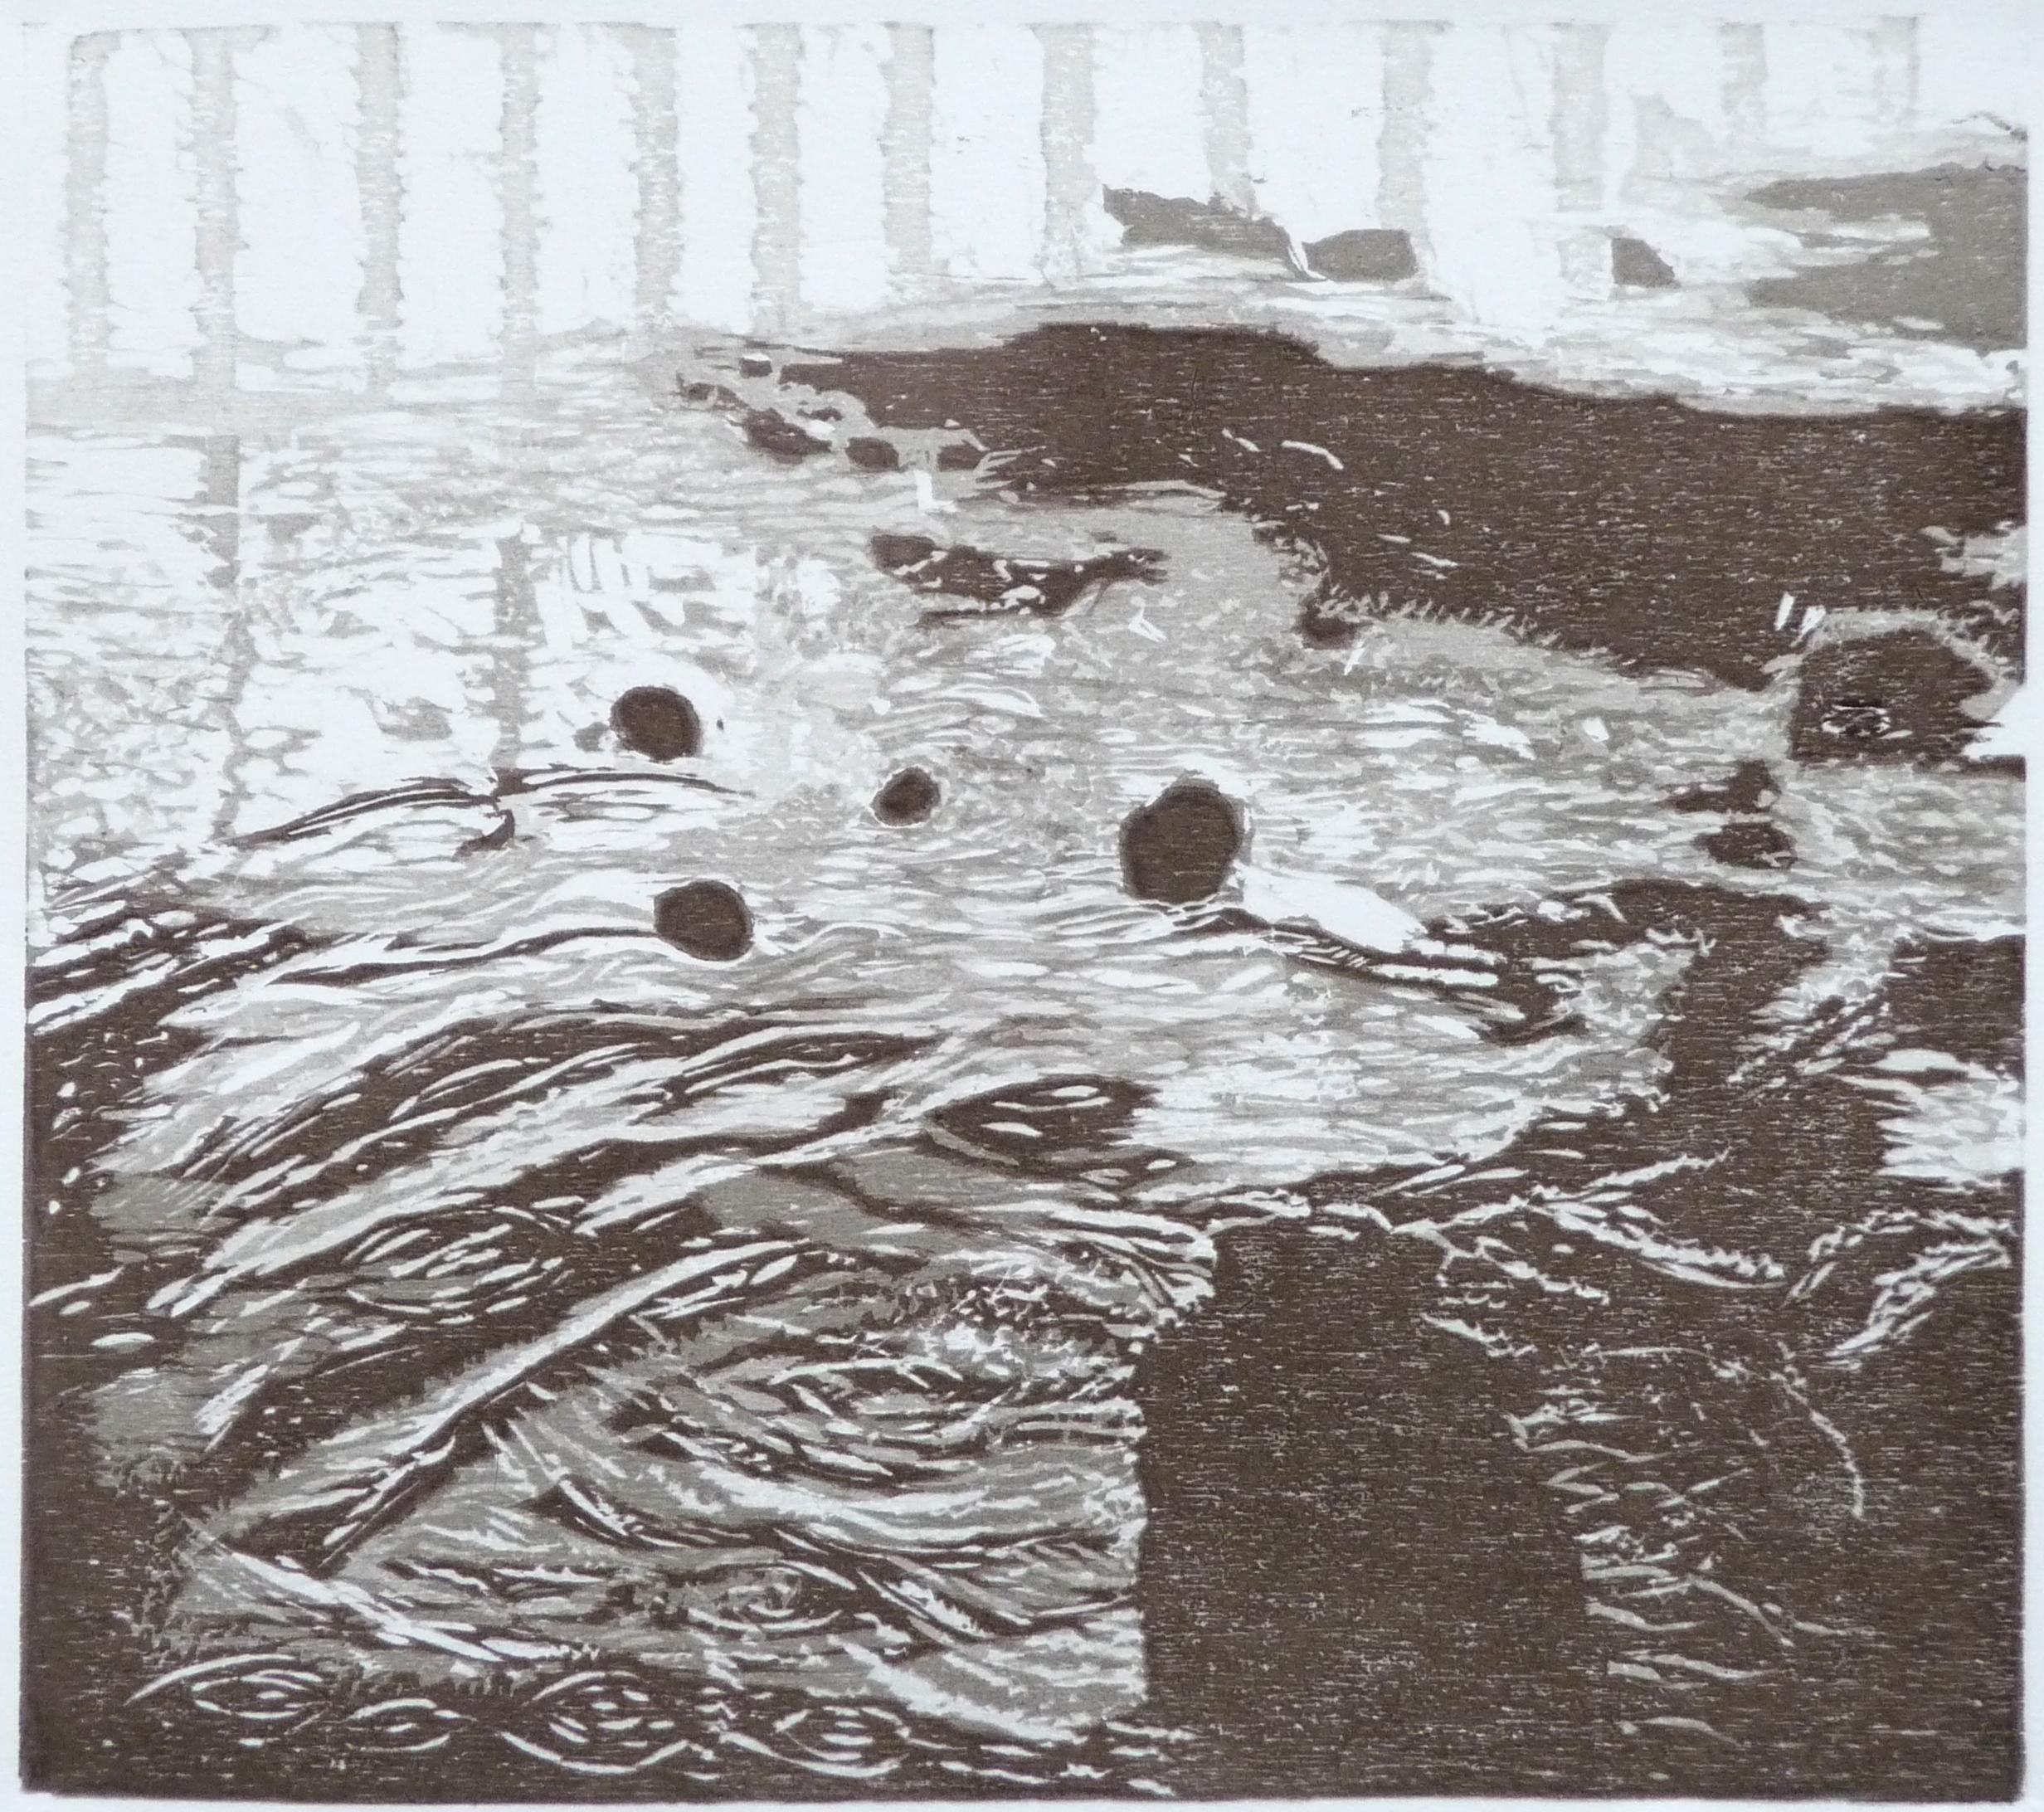 Gewässer, woodcut, 31 x 35 cm, 2016